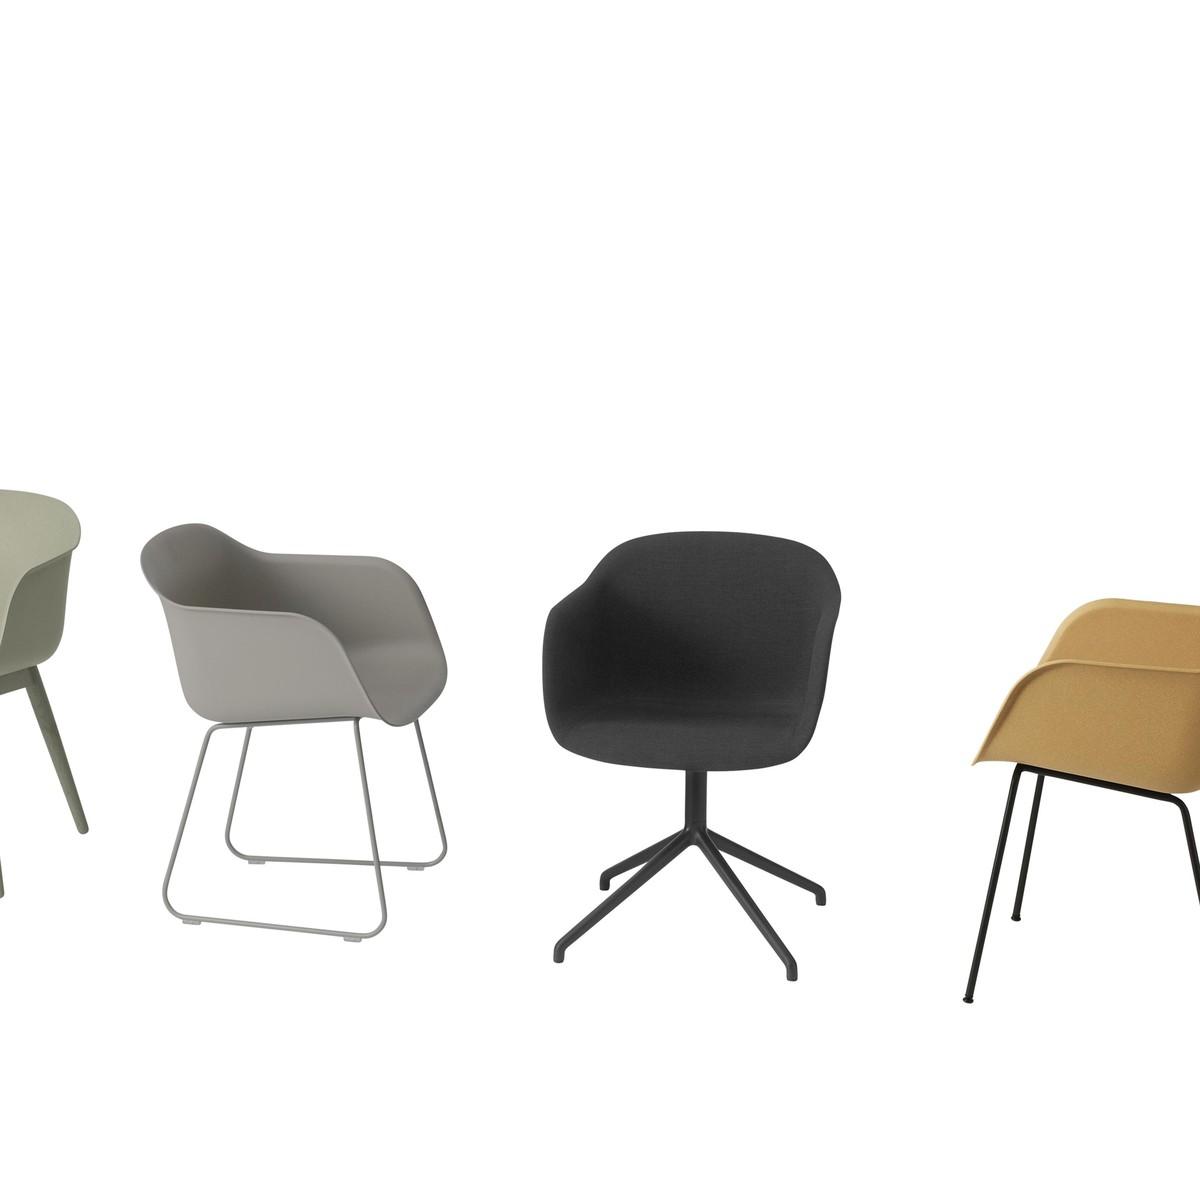 fiber chair chaise pivotante muuto. Black Bedroom Furniture Sets. Home Design Ideas